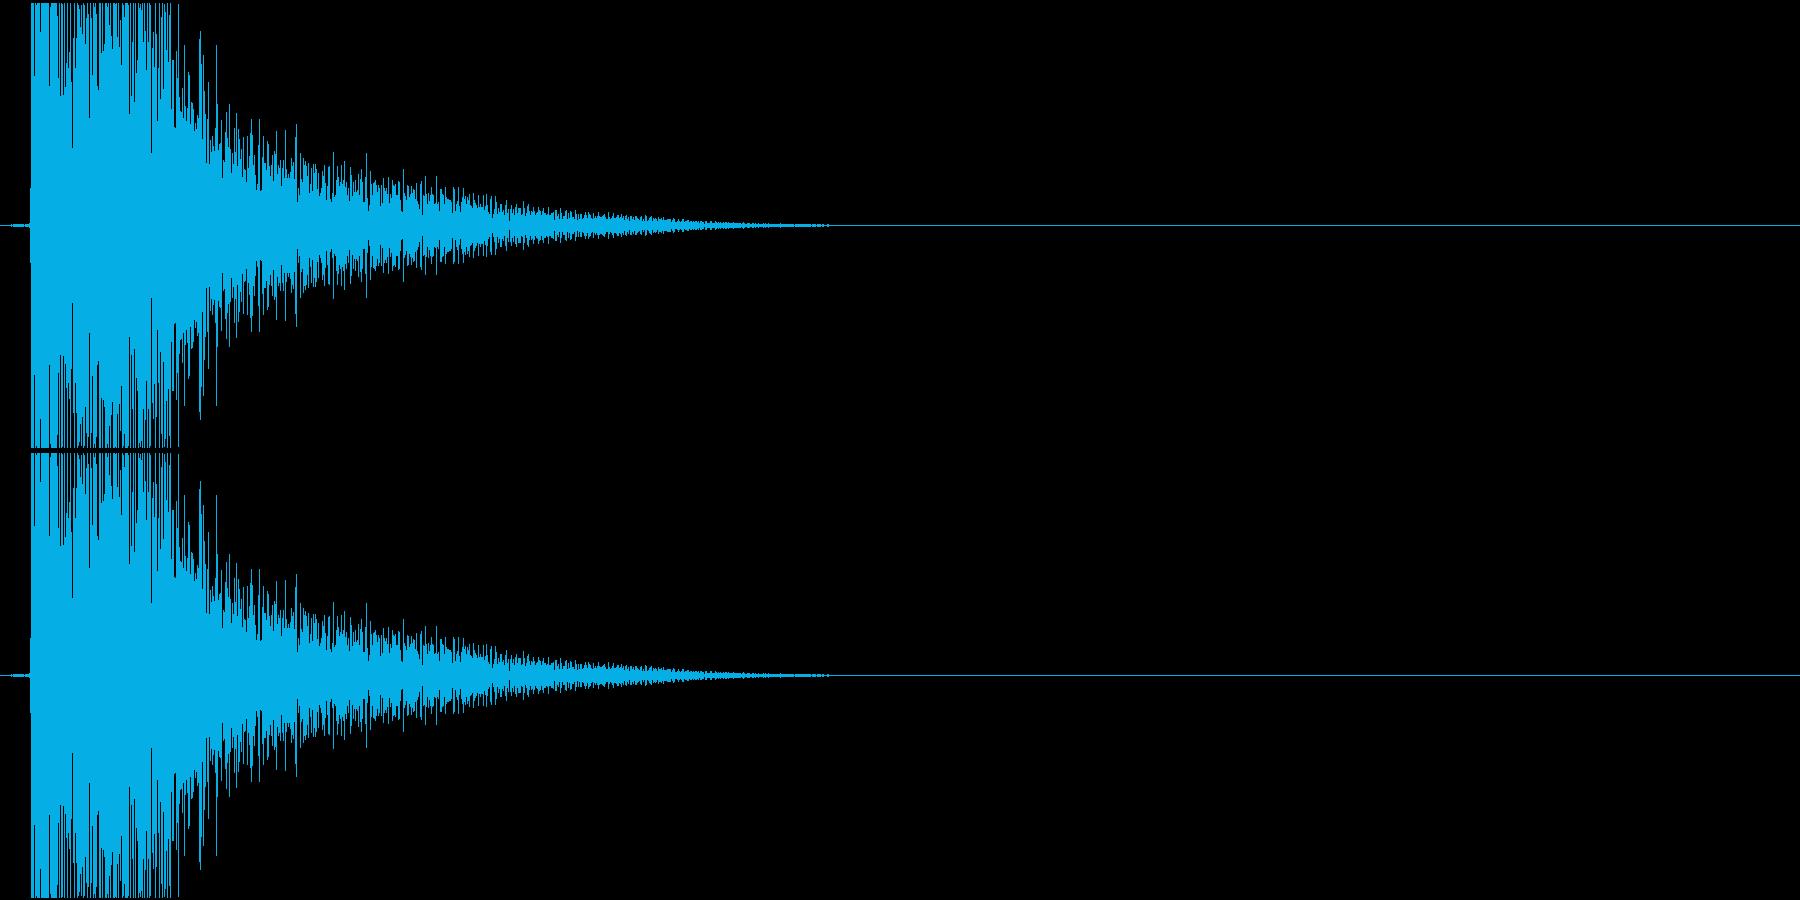 Katana 脇差や小刀、鉄爪の斬撃音の再生済みの波形